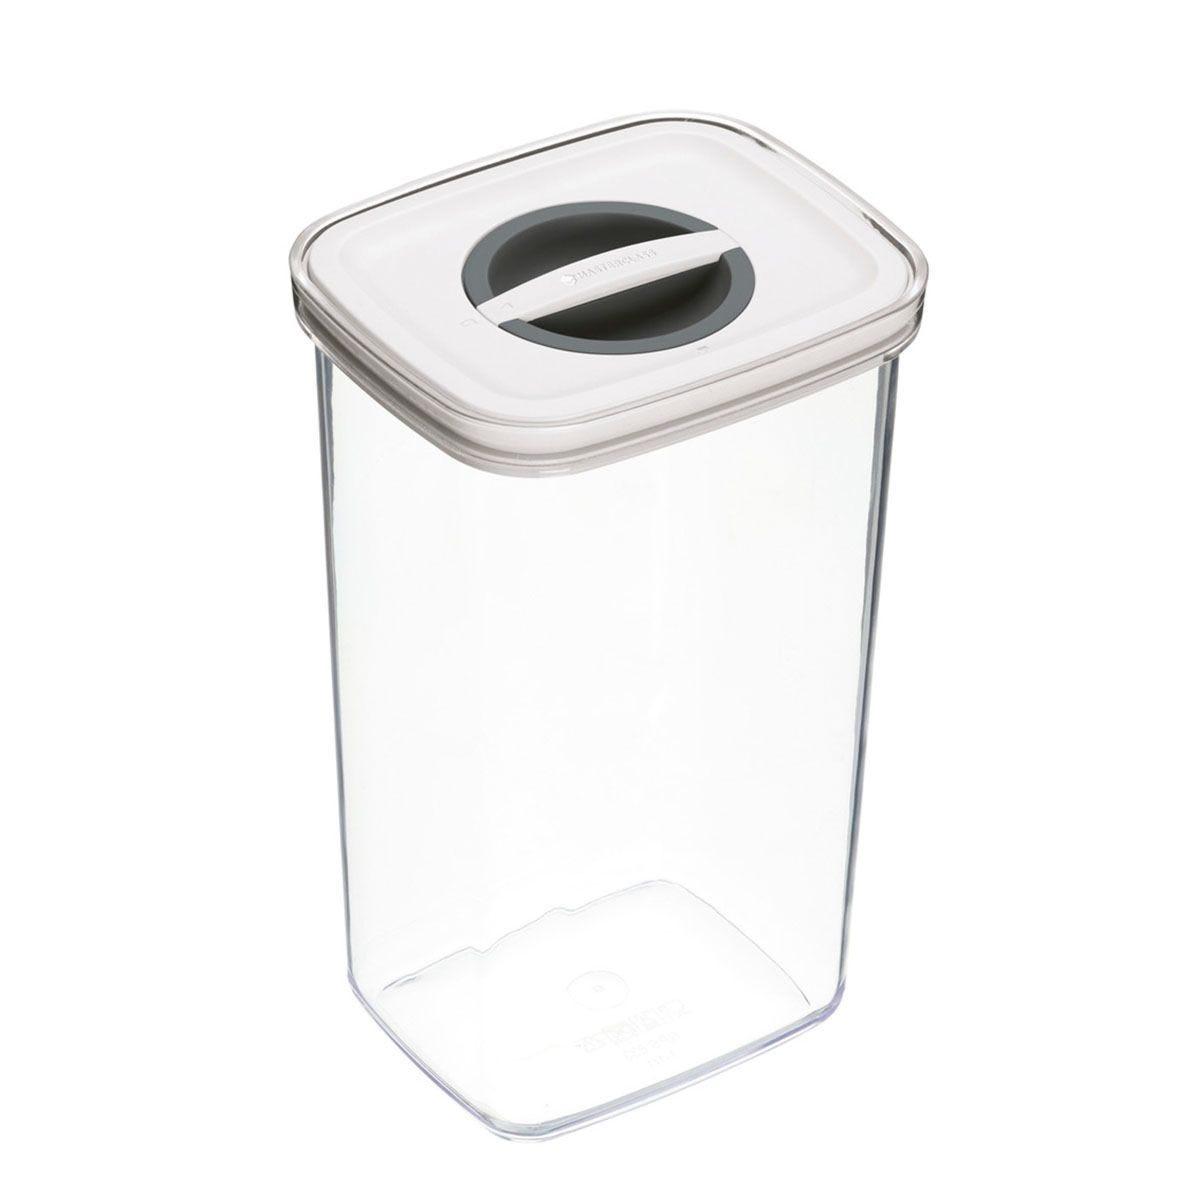 MasterClass Smart Seal Rectangular Food Container - 2 Litre